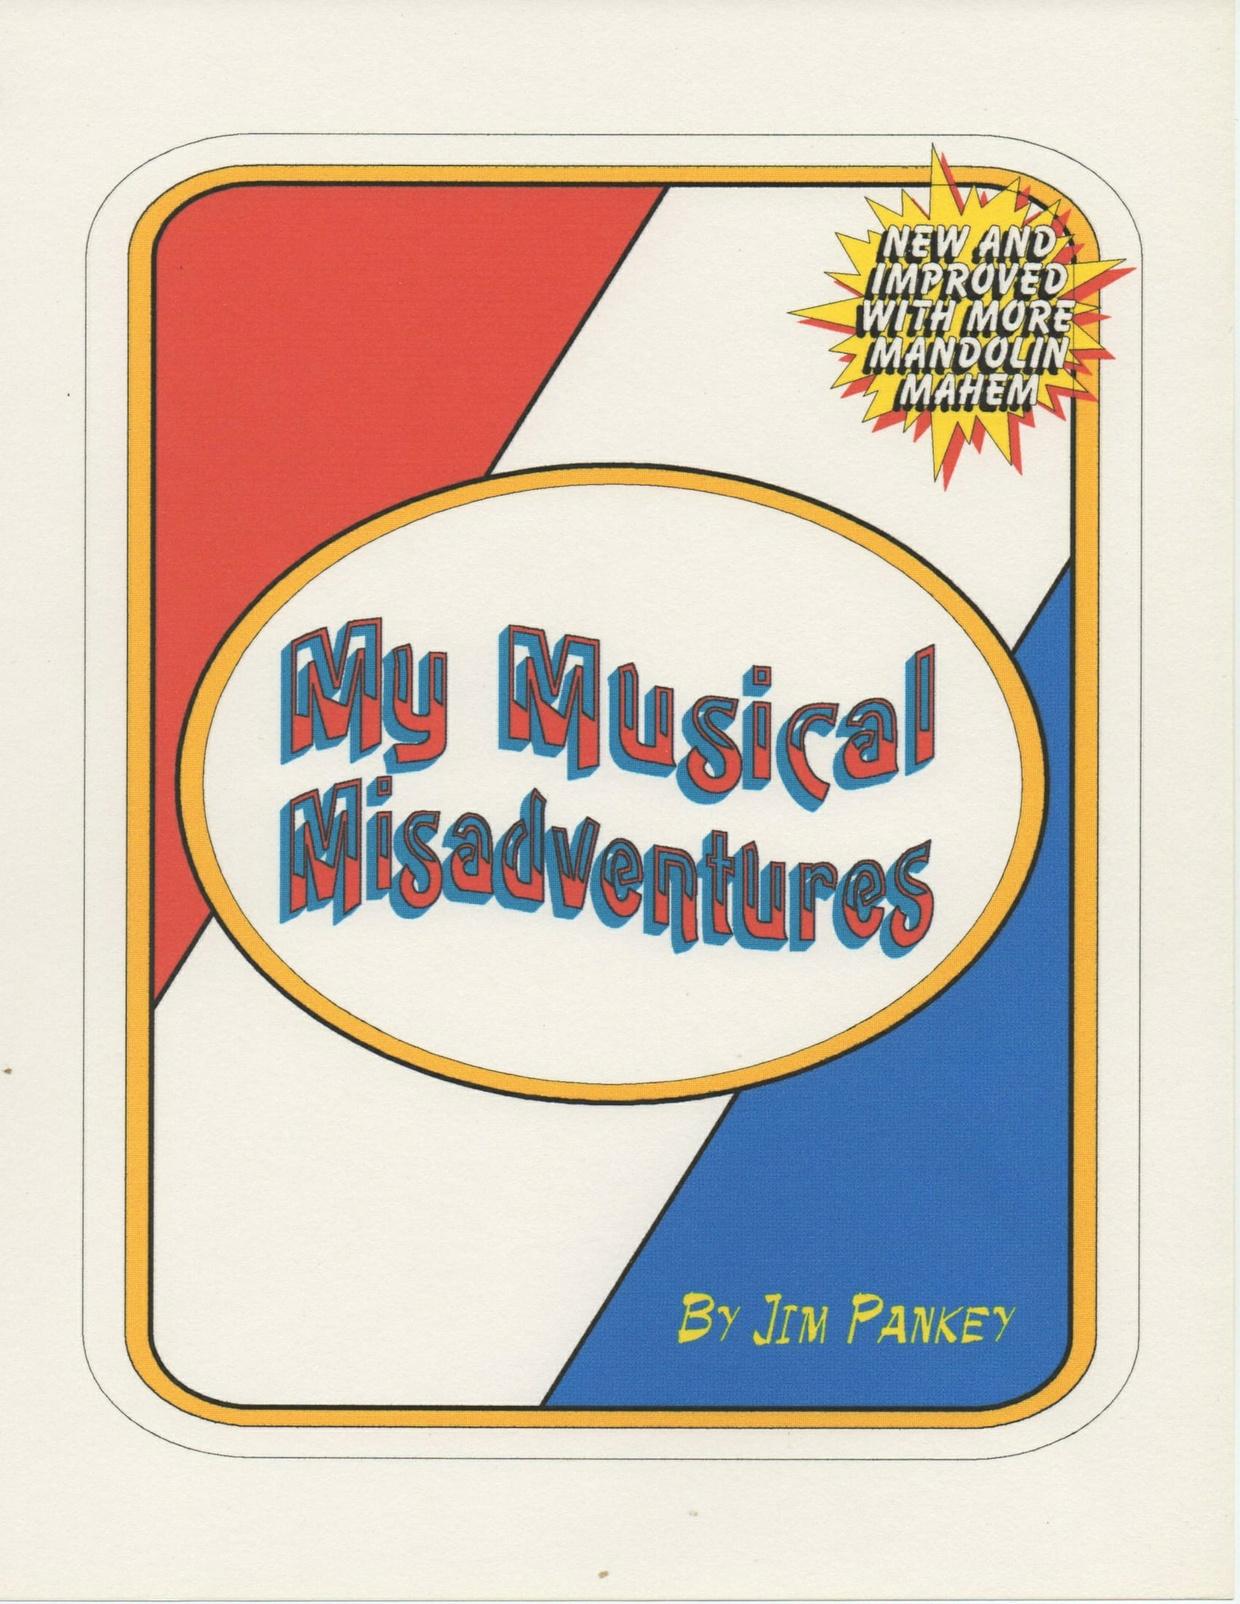 My Musical Misadventures